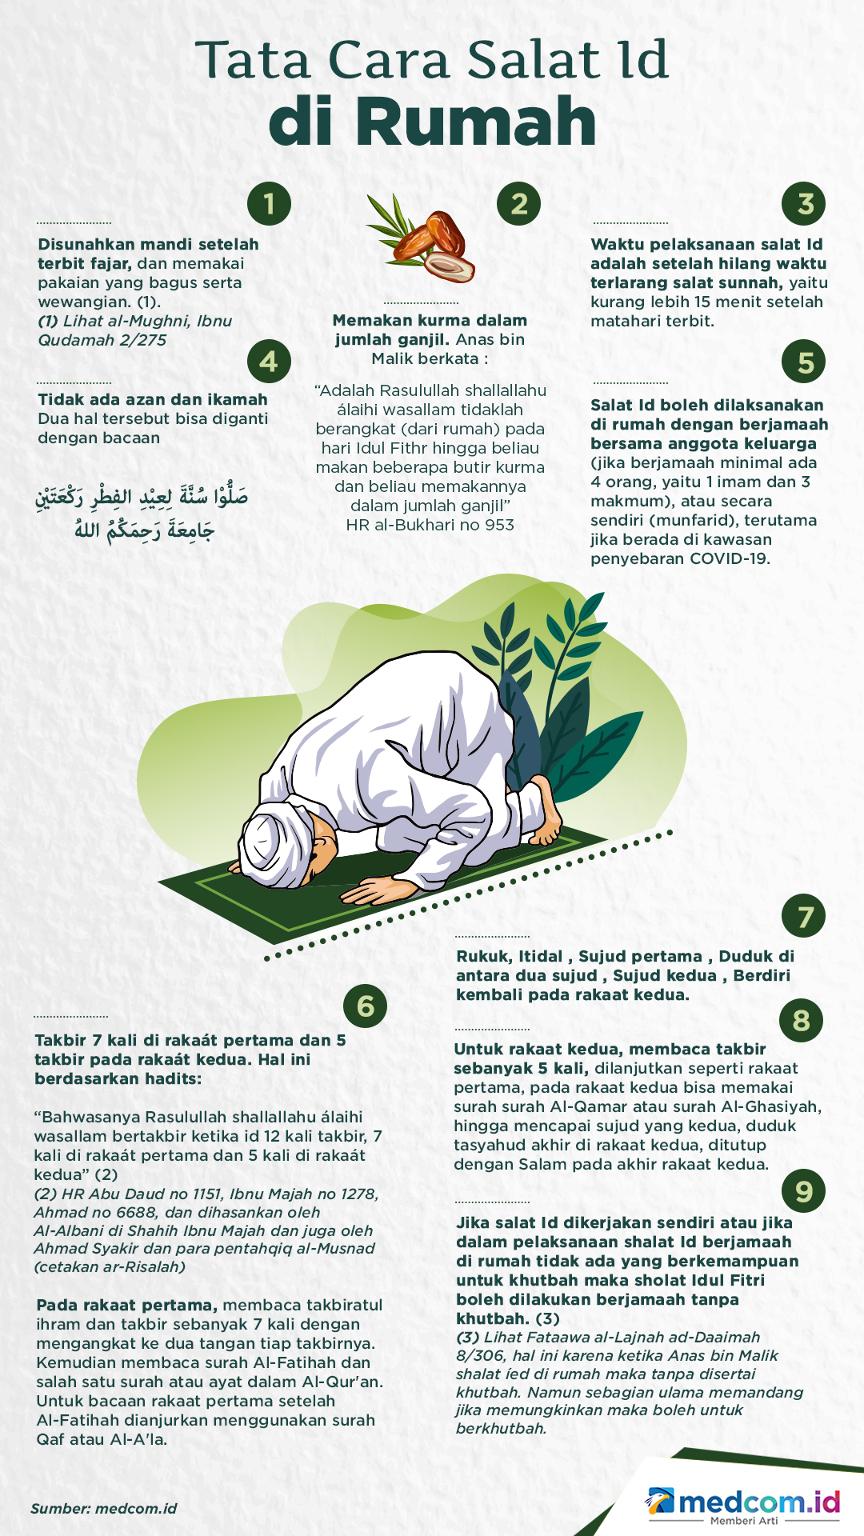 DMI Belum Terima Laporan Masjid di Jakarta Gelar Salat Id